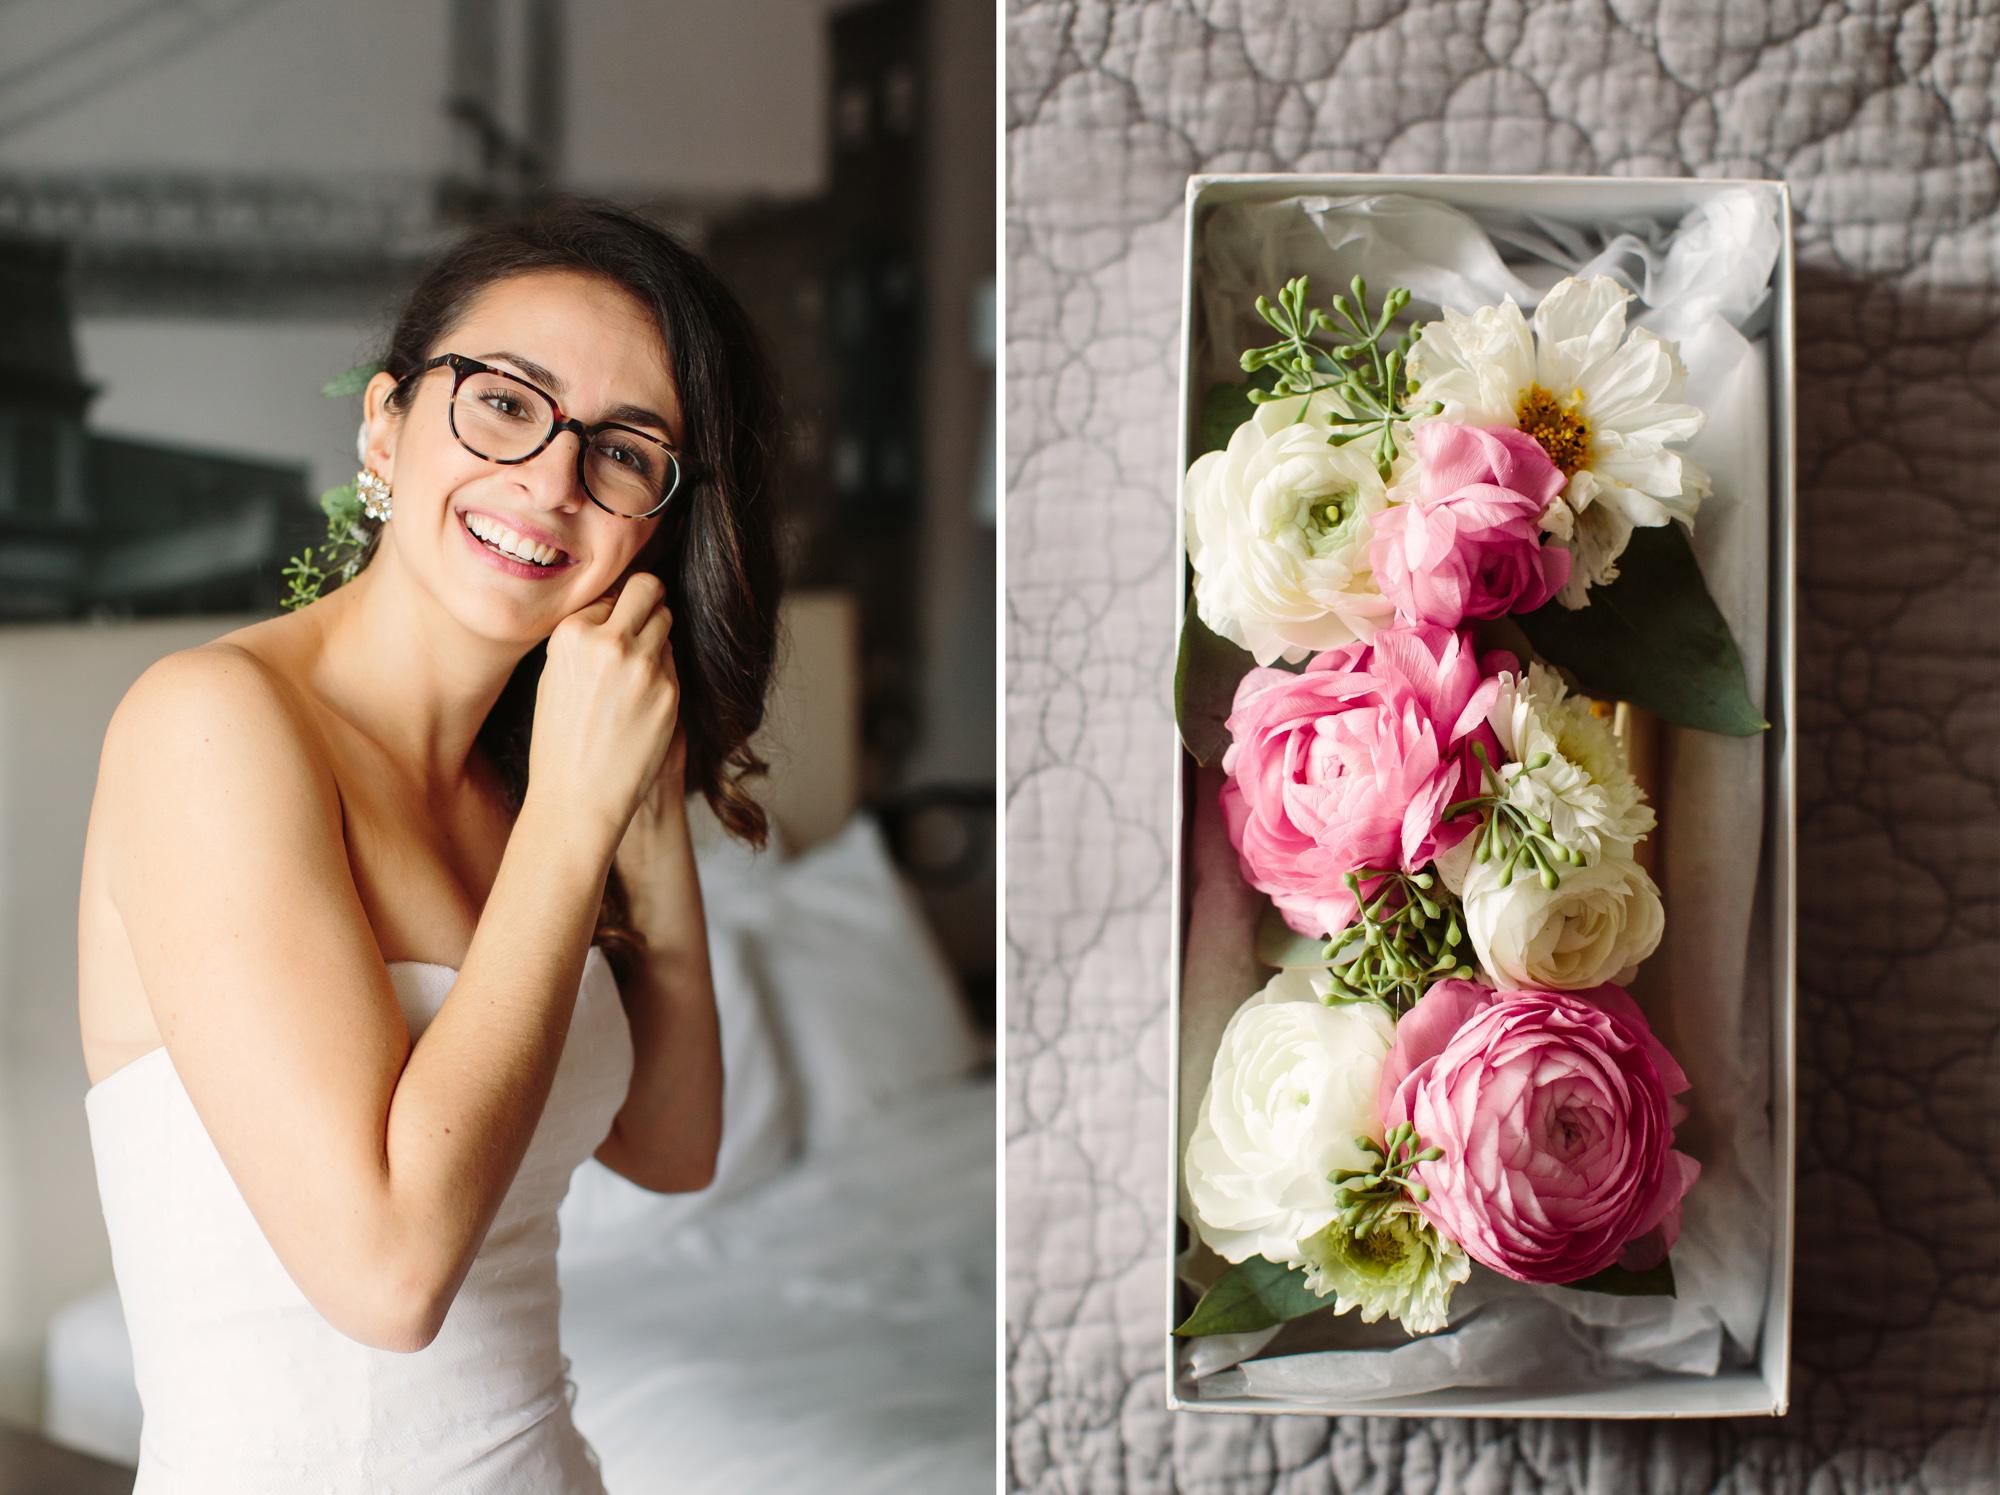 08_Kate_Sam_Picnic_House_Wedding_Brooklyn_NY_Tanya_Salazar_Photography.jpg